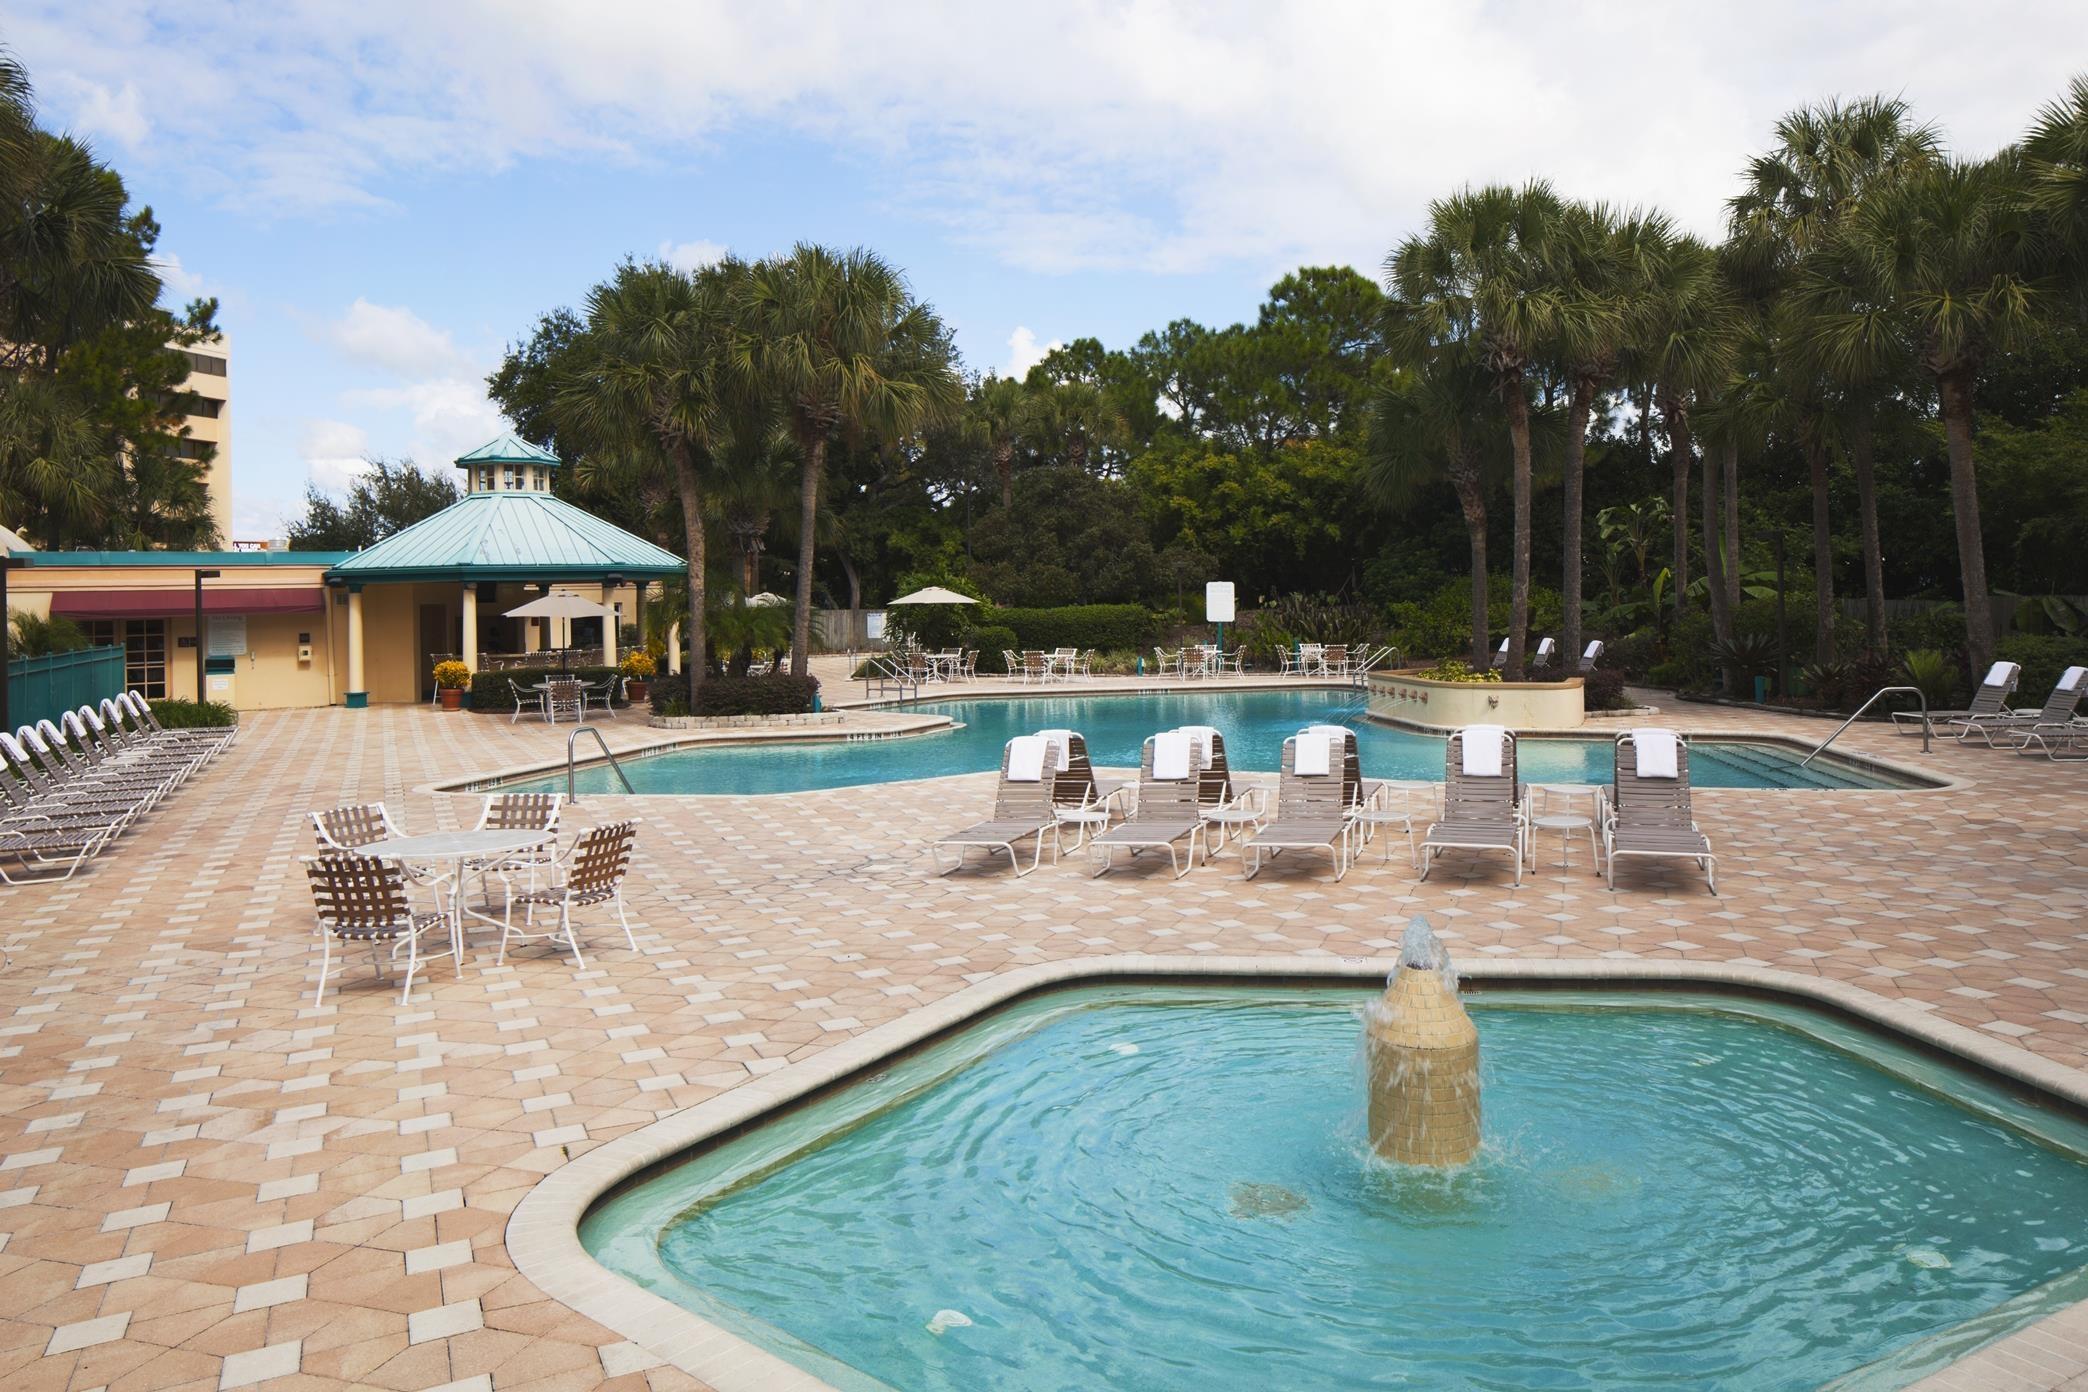 DoubleTree Suites by Hilton Orlando - Disney Springs Area image 23